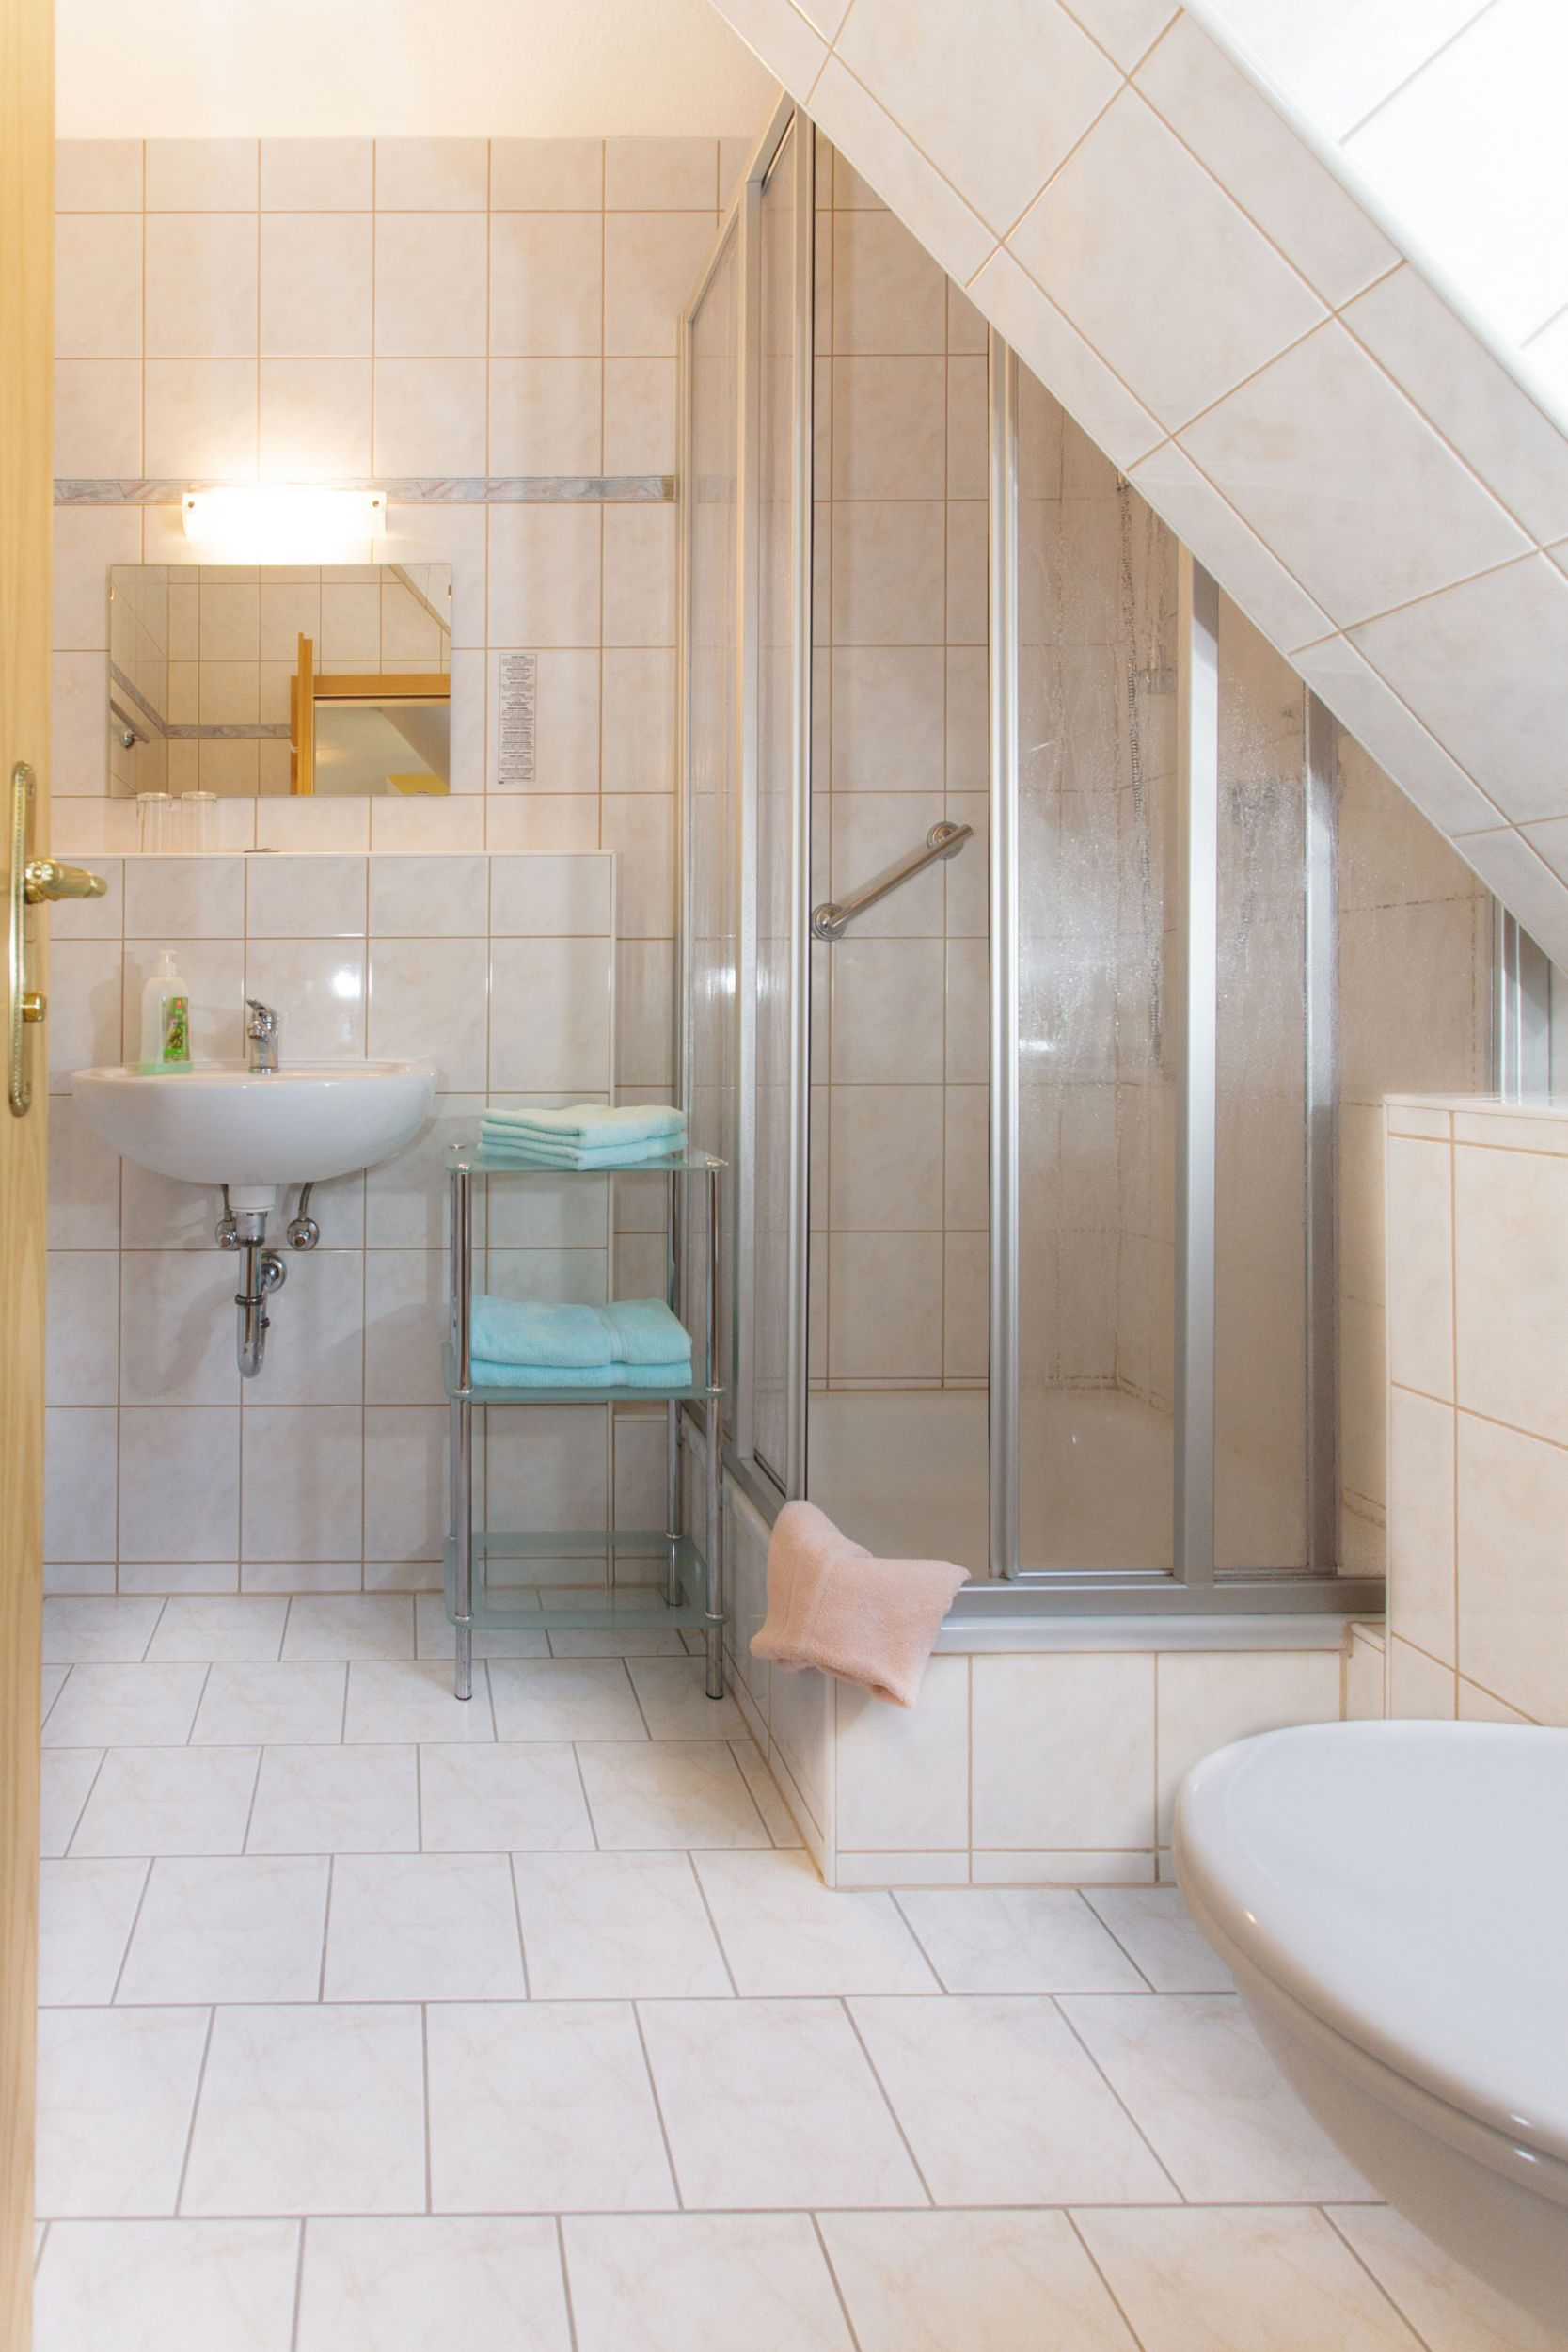 zimmer preise landhotel zum hammer. Black Bedroom Furniture Sets. Home Design Ideas